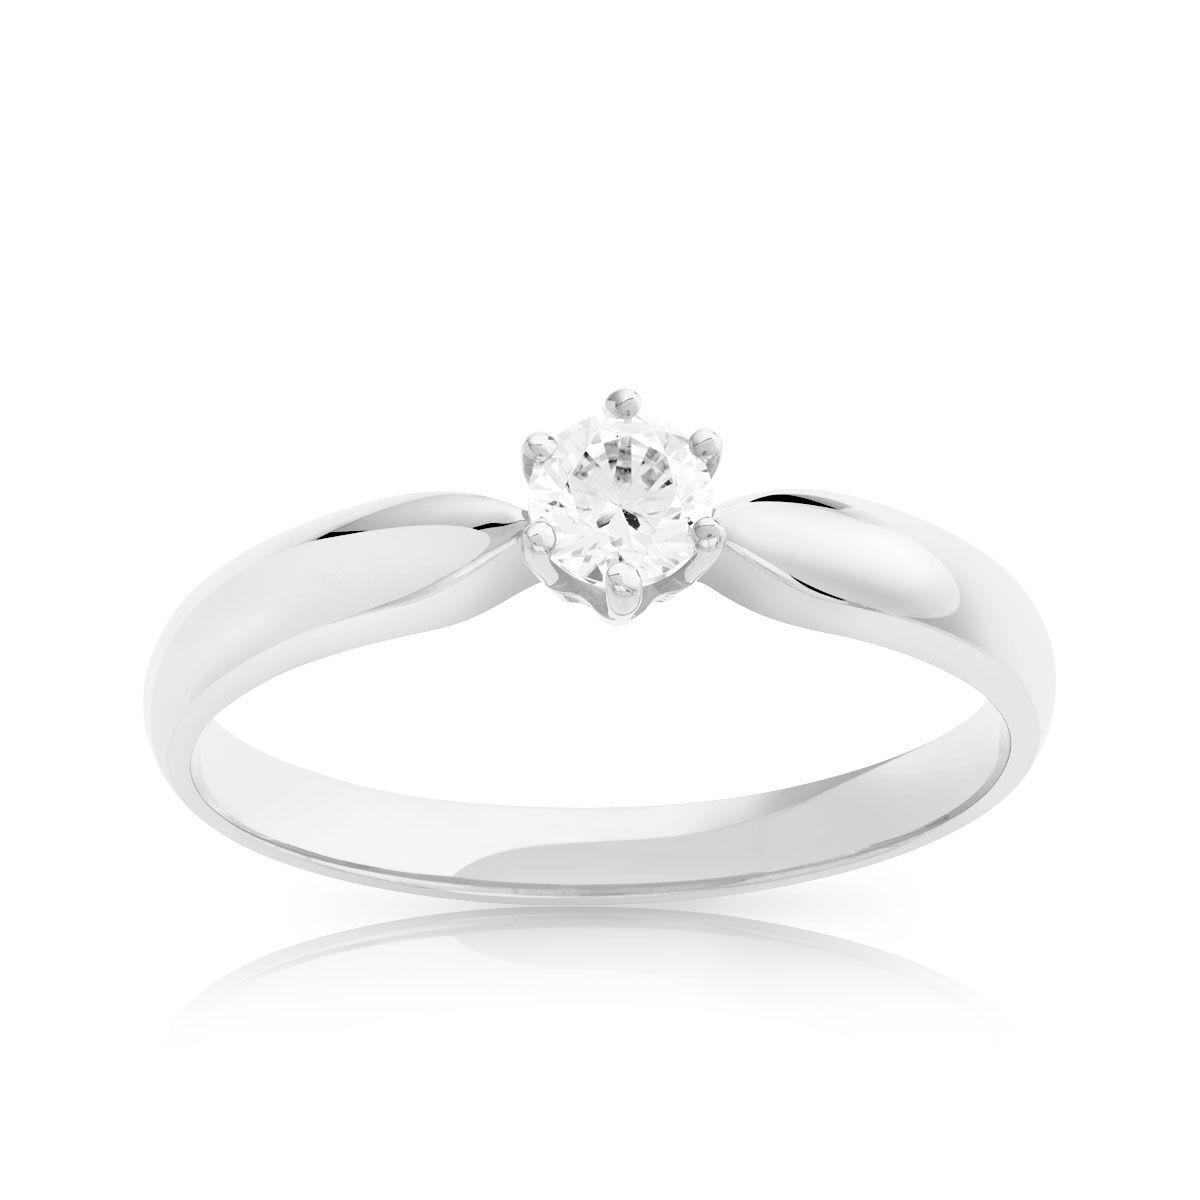 MATY Bague Solitaire or 750 blanc diamant 0.20 carat- MATY